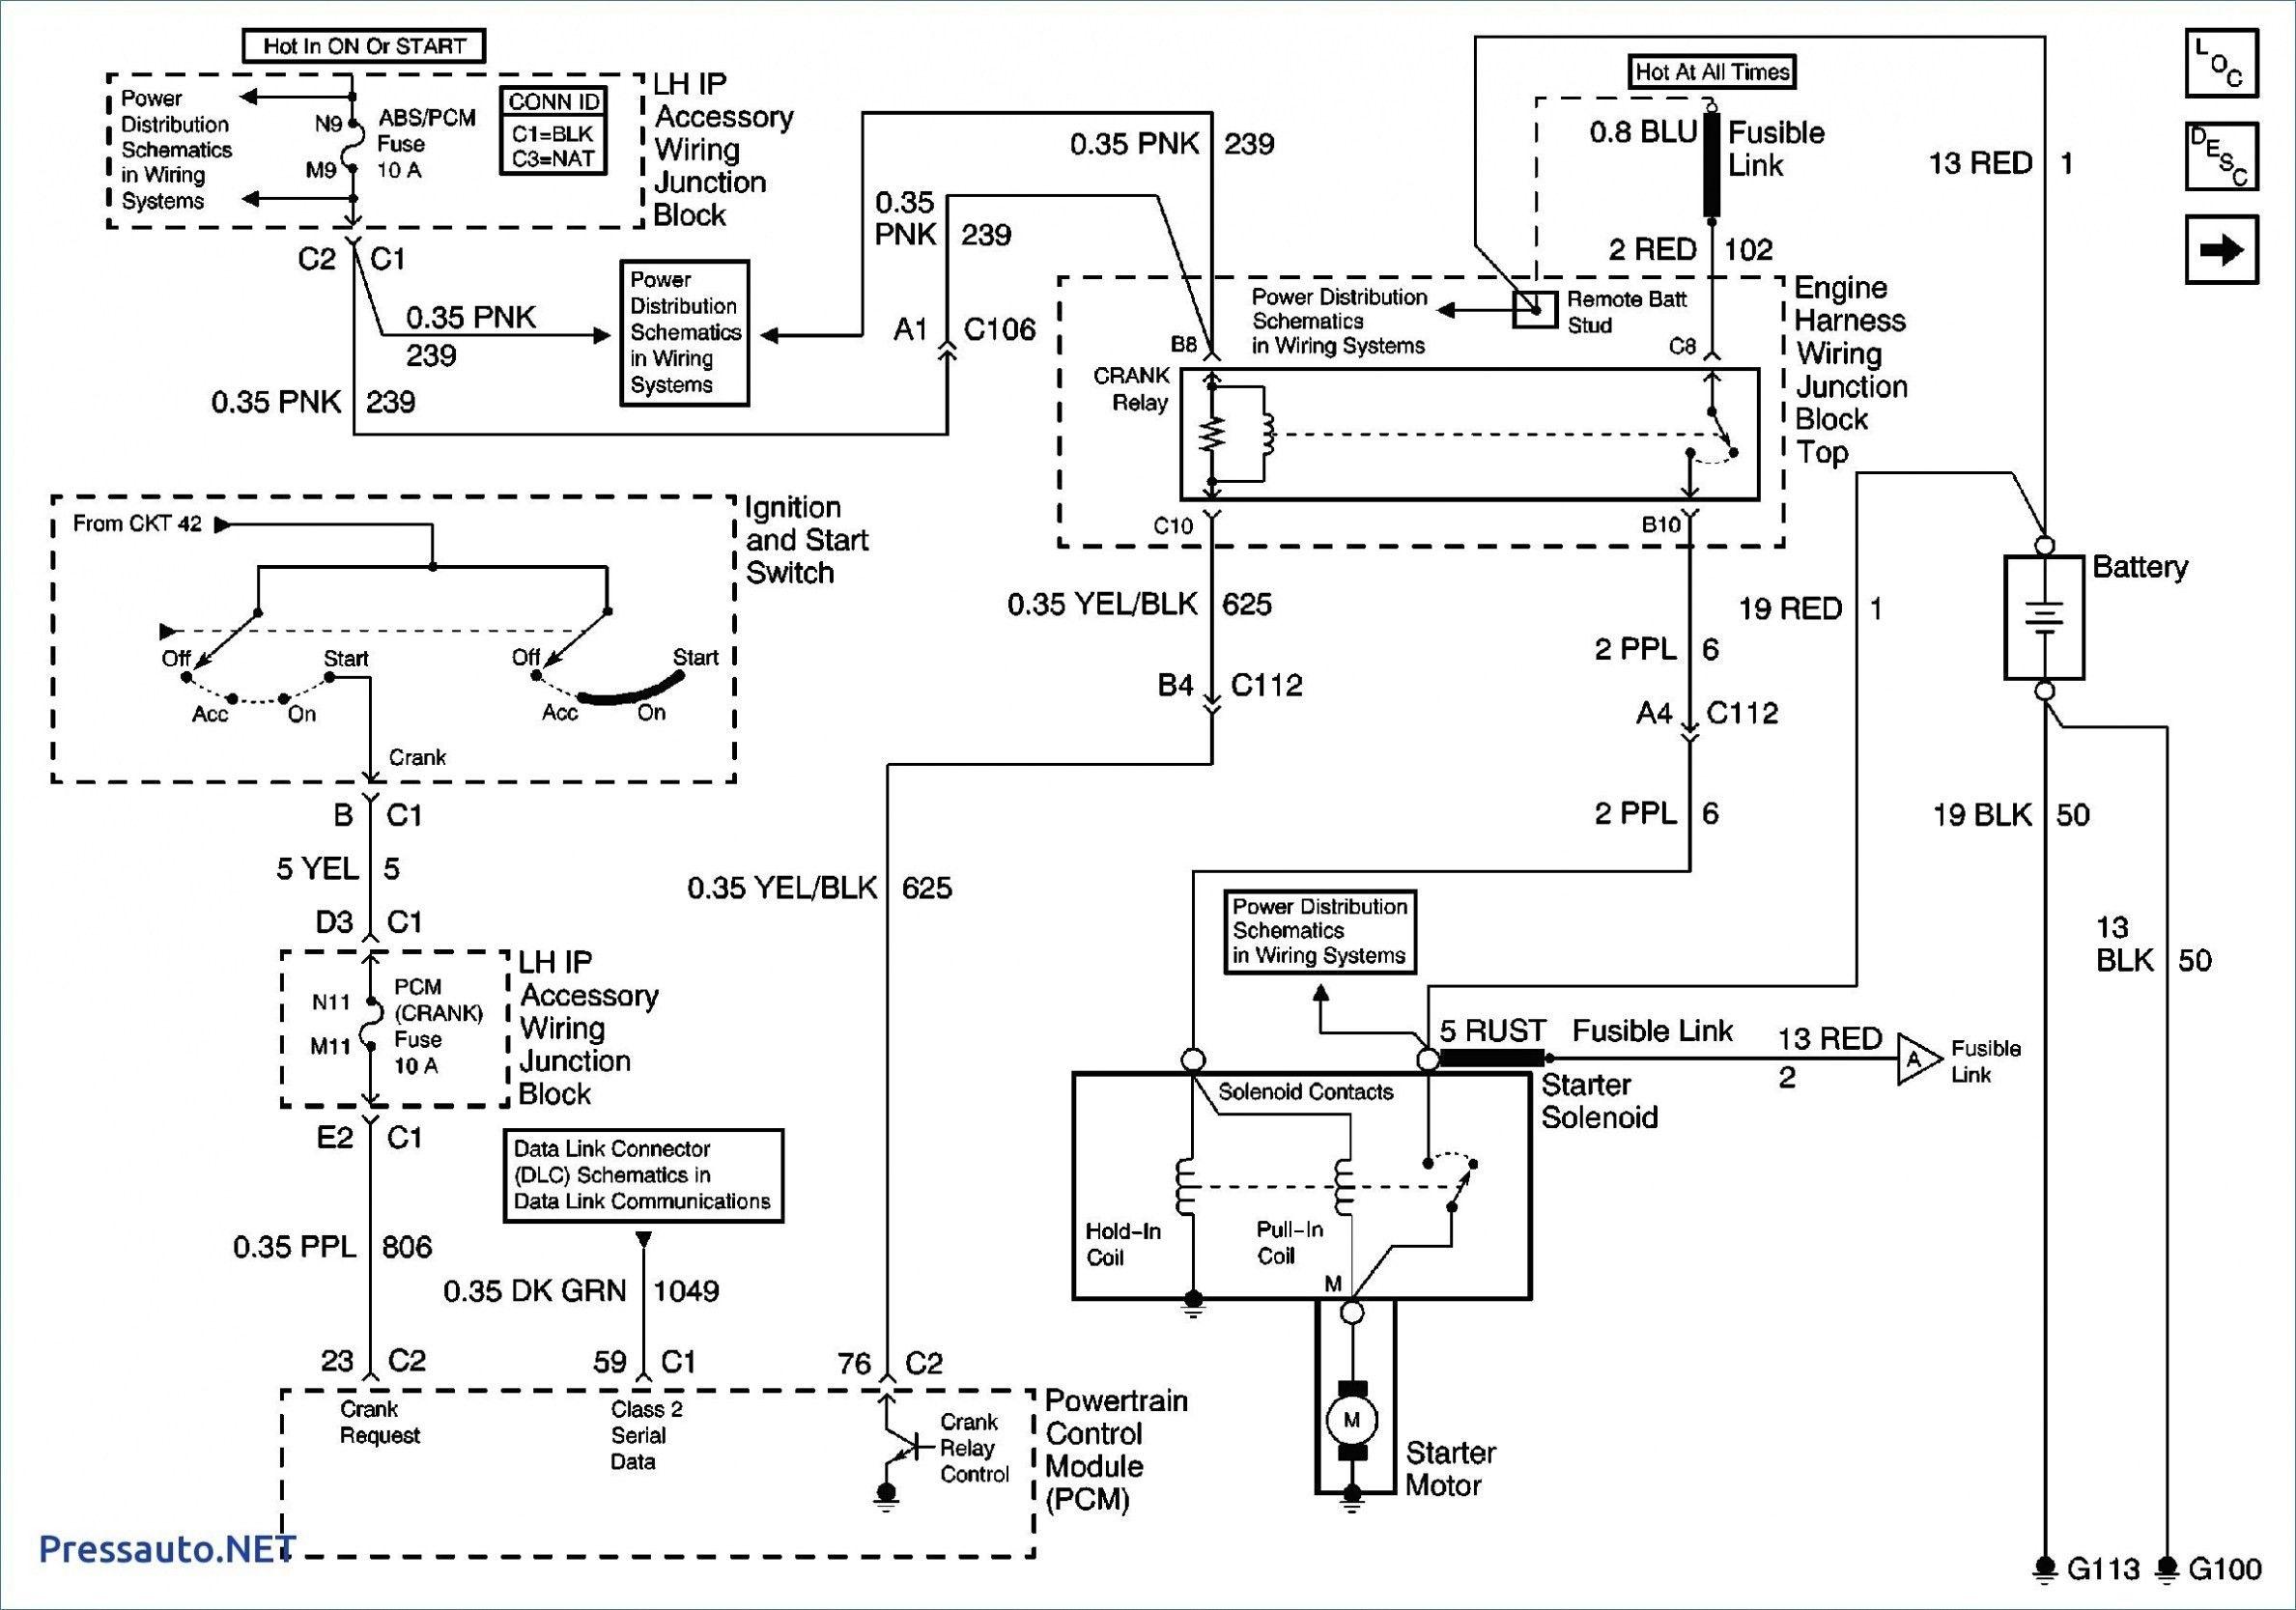 New Contactor Wiring Diagram Single Phase (con imágenes